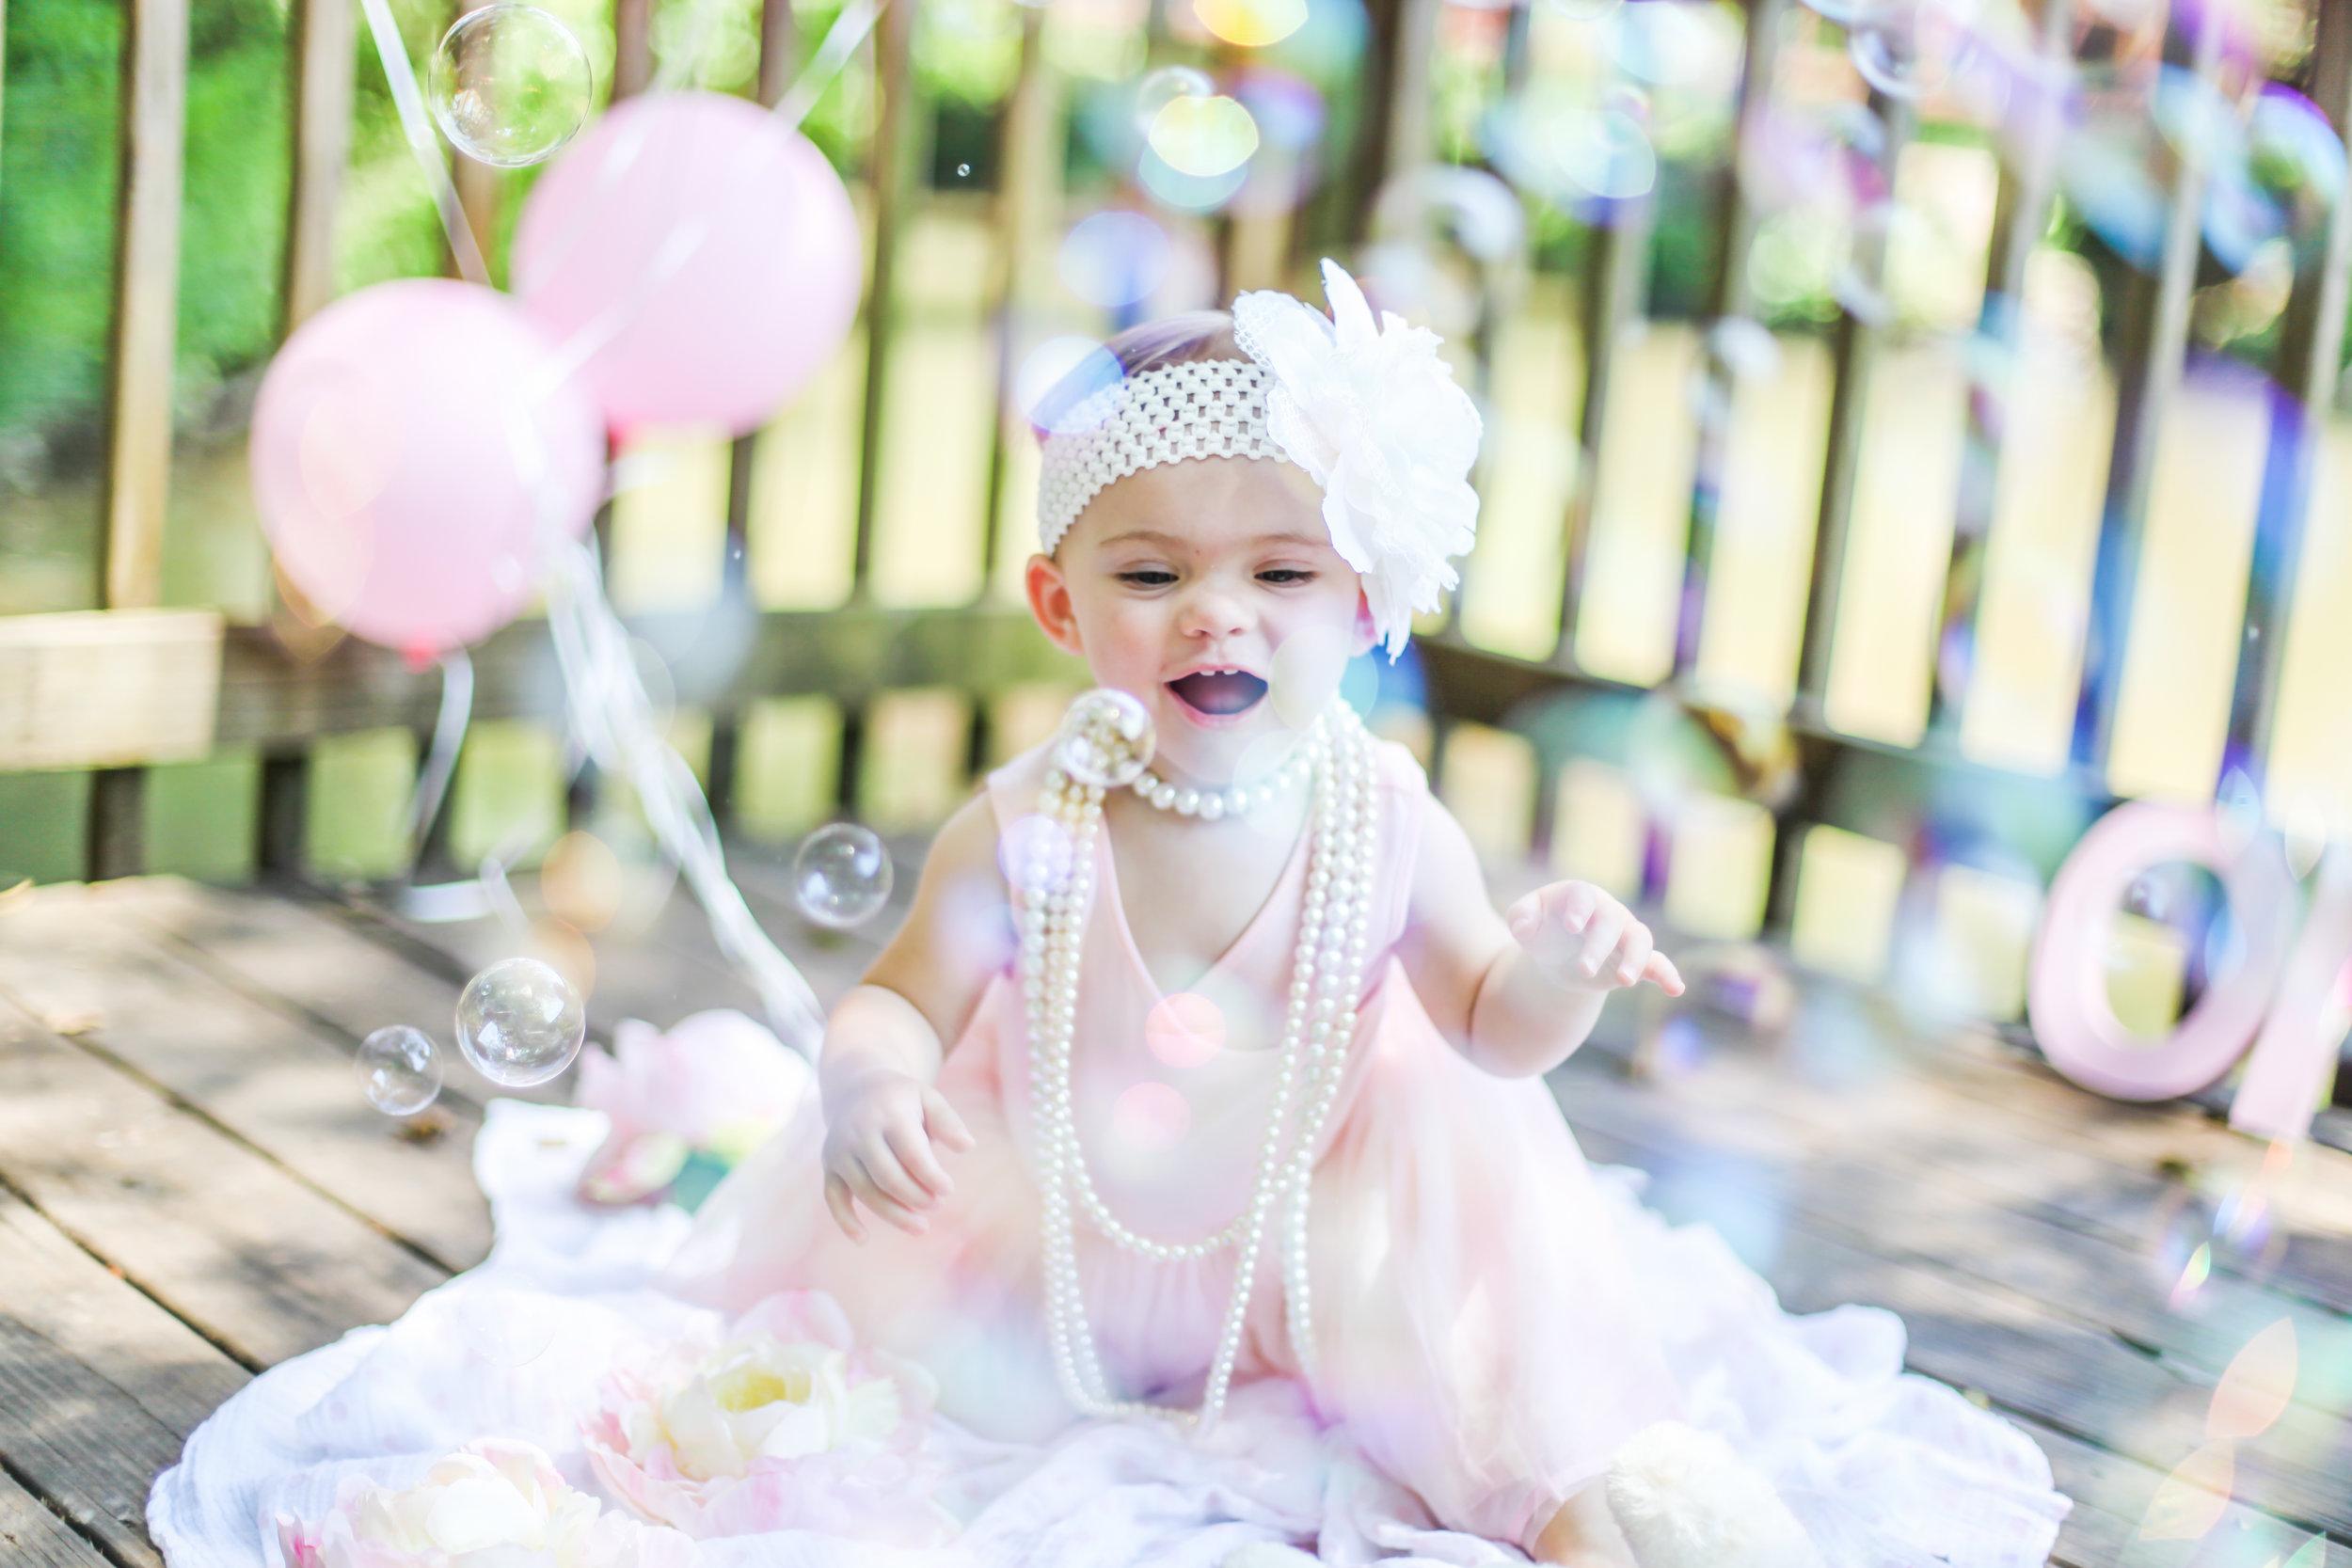 woodstock baby photography angela elliott-53.jpg